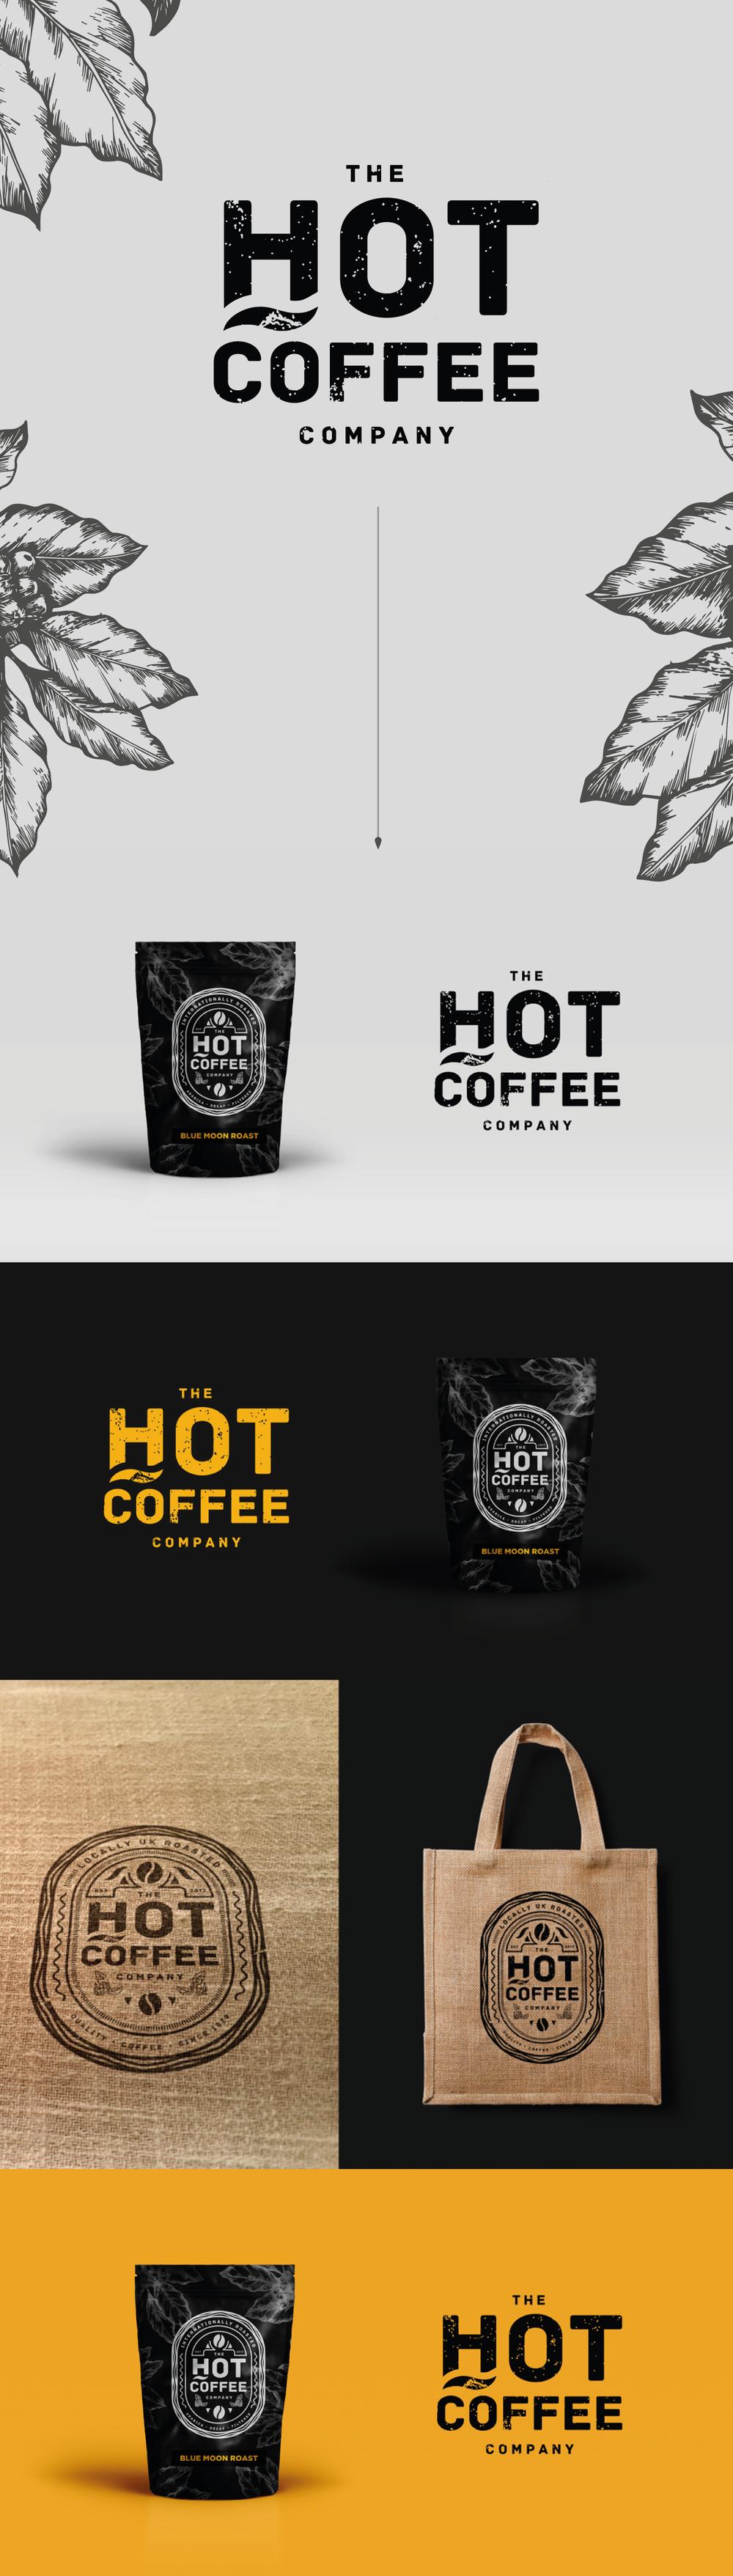 HotCoffee-Branding.png